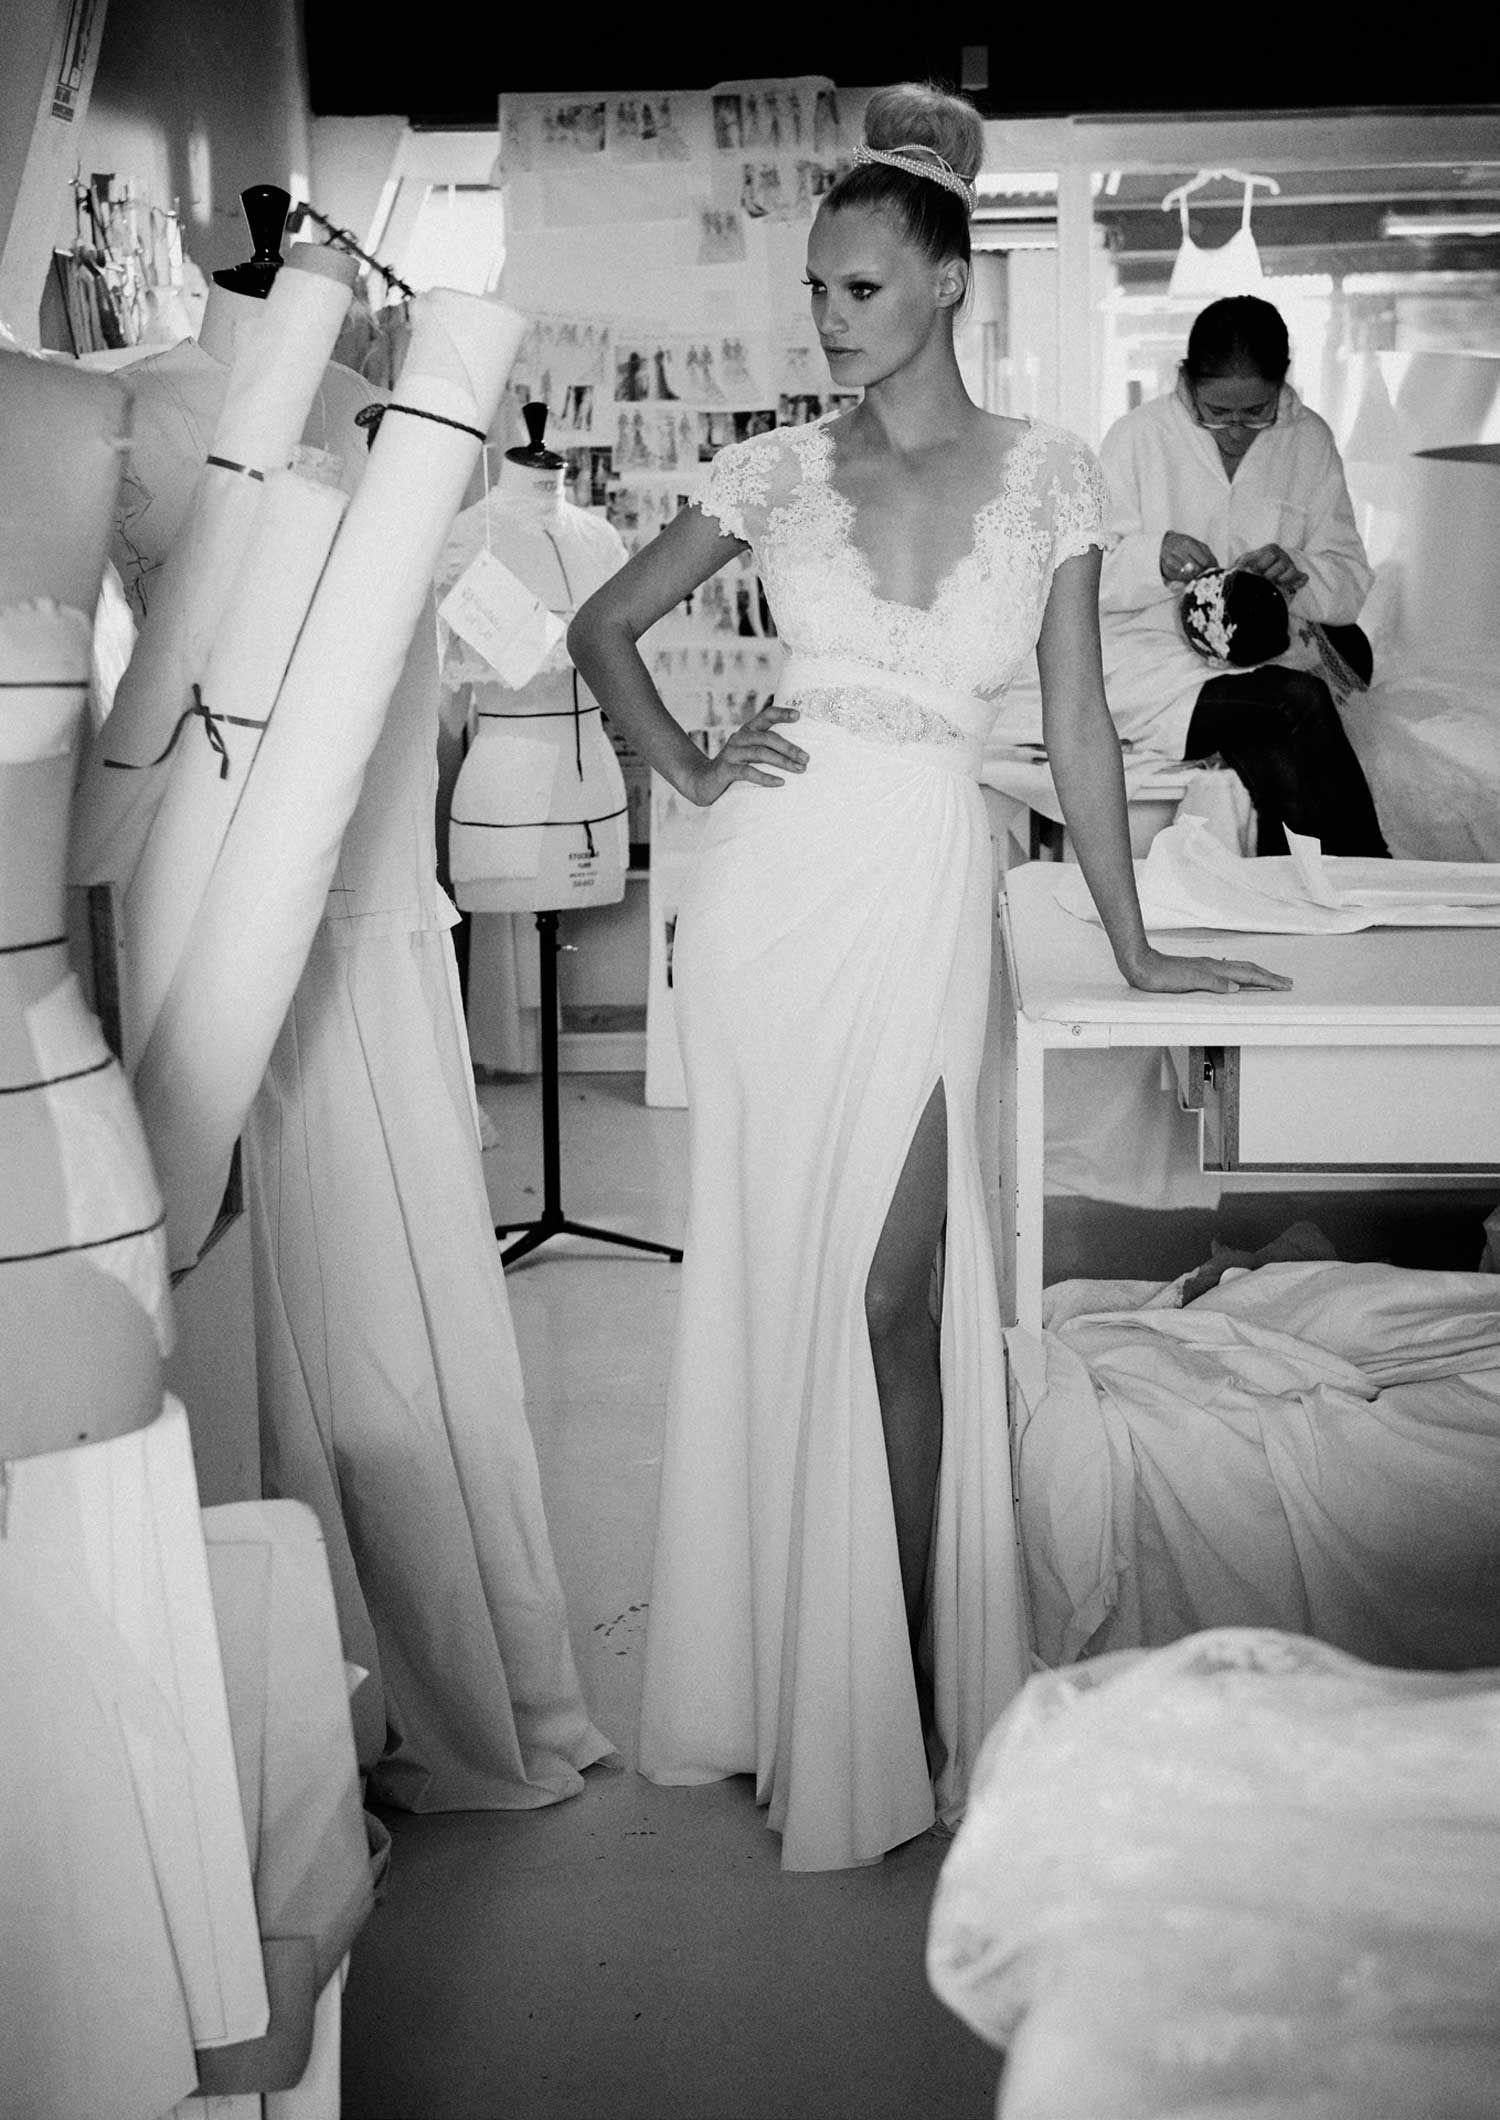 Idylle Jpg 1 500 2 120 Pixels Cymbeline Wedding Dresses Wedding Dresses 2015 Wedding Dresses [ 2120 x 1500 Pixel ]